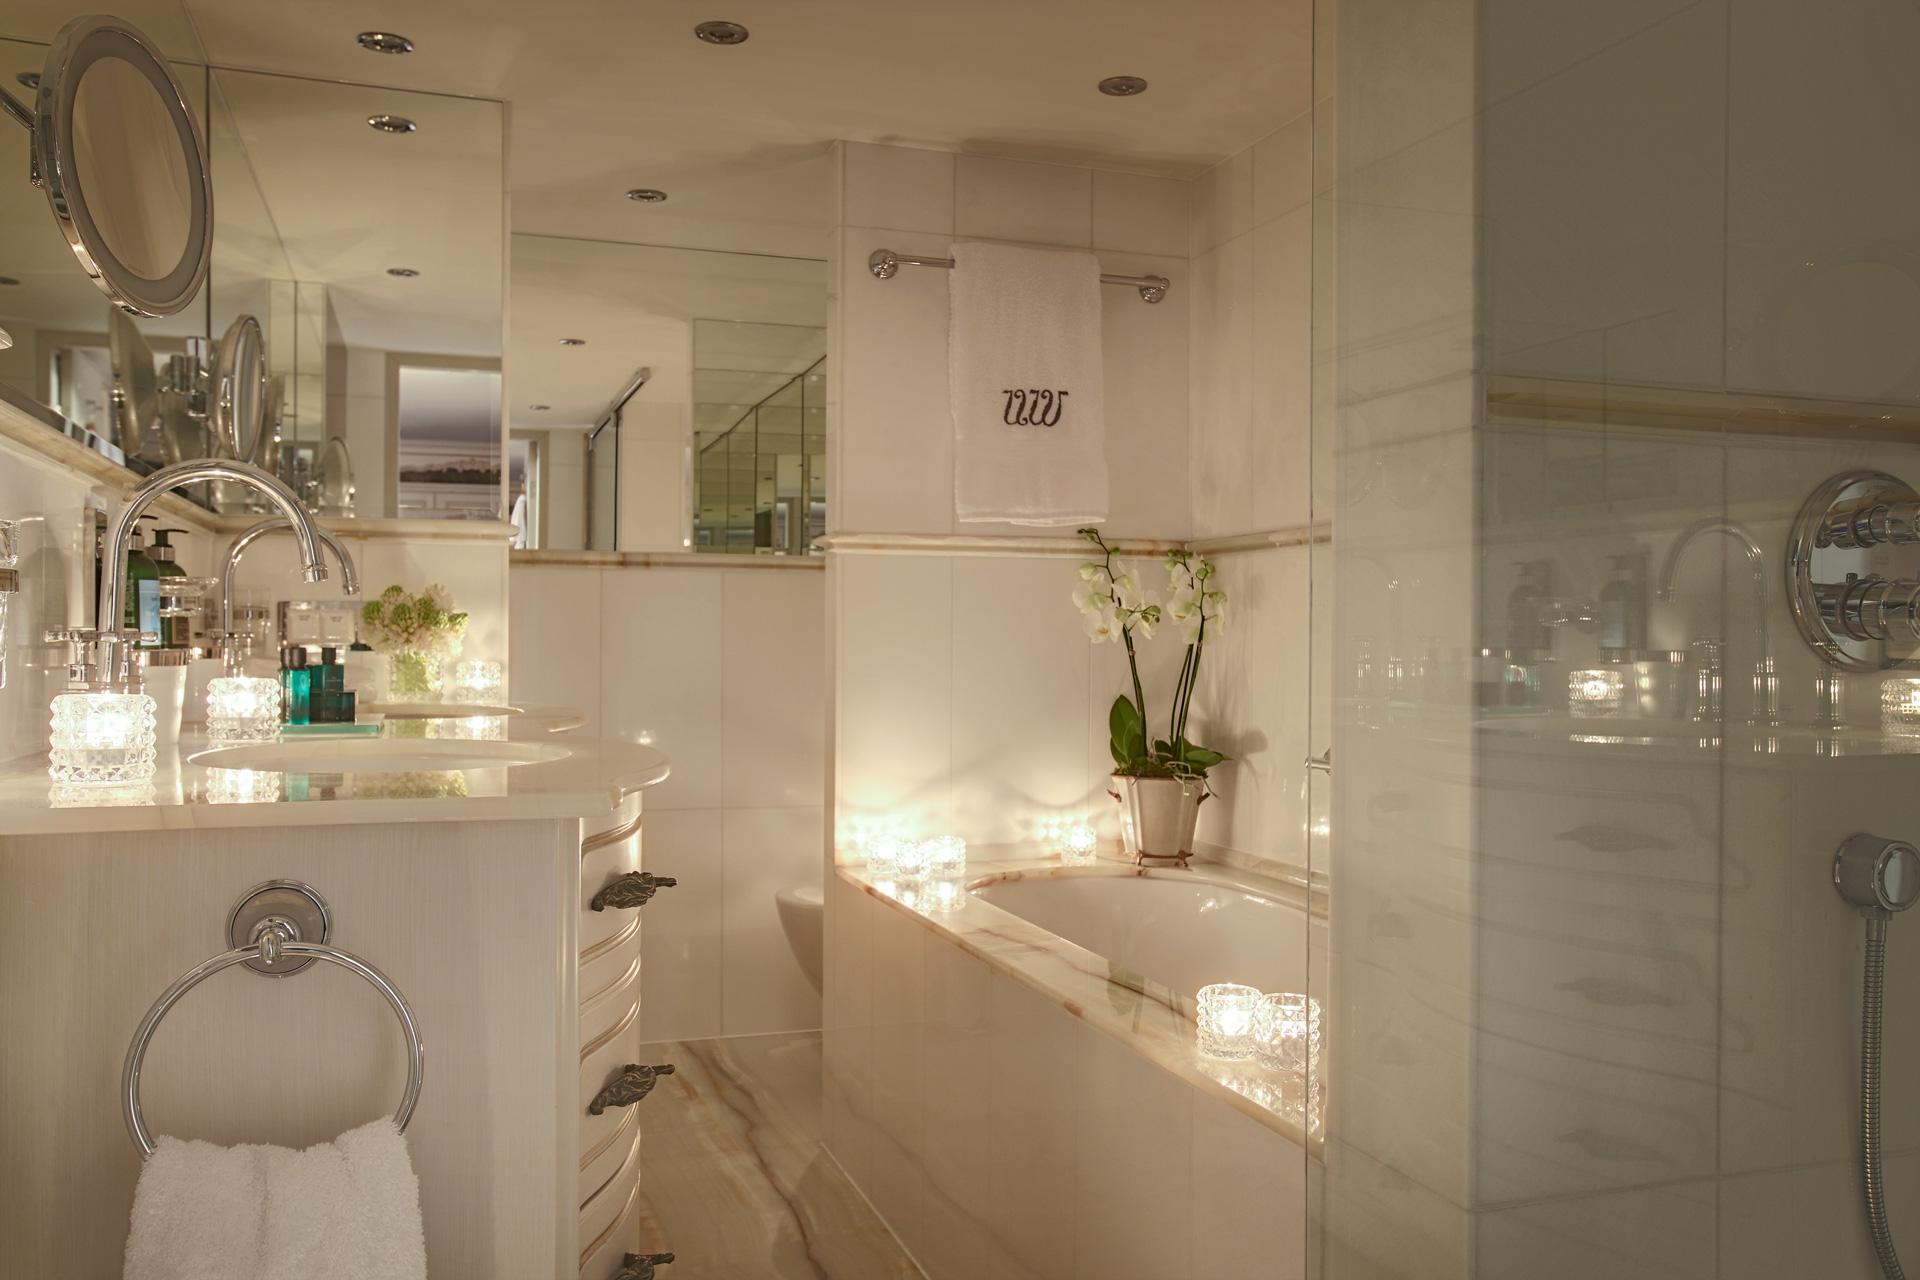 UNIWORLD Boutique River Cruises SS Maria Theresa Accommodation Royal Suite Bathroom.jpg